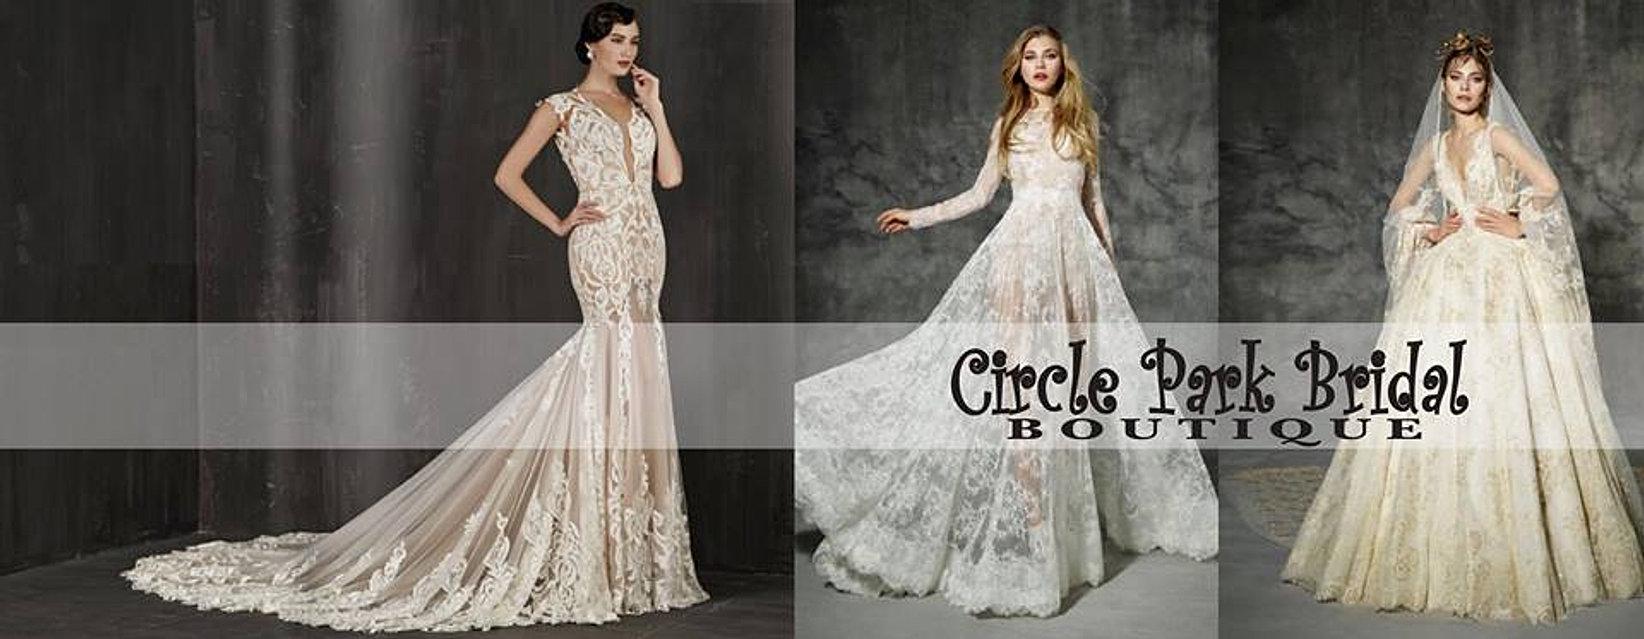 Wedding Gowns Dallas Fort Worth : Dallas bridal wedding dresses bridesmaid gowns accessories